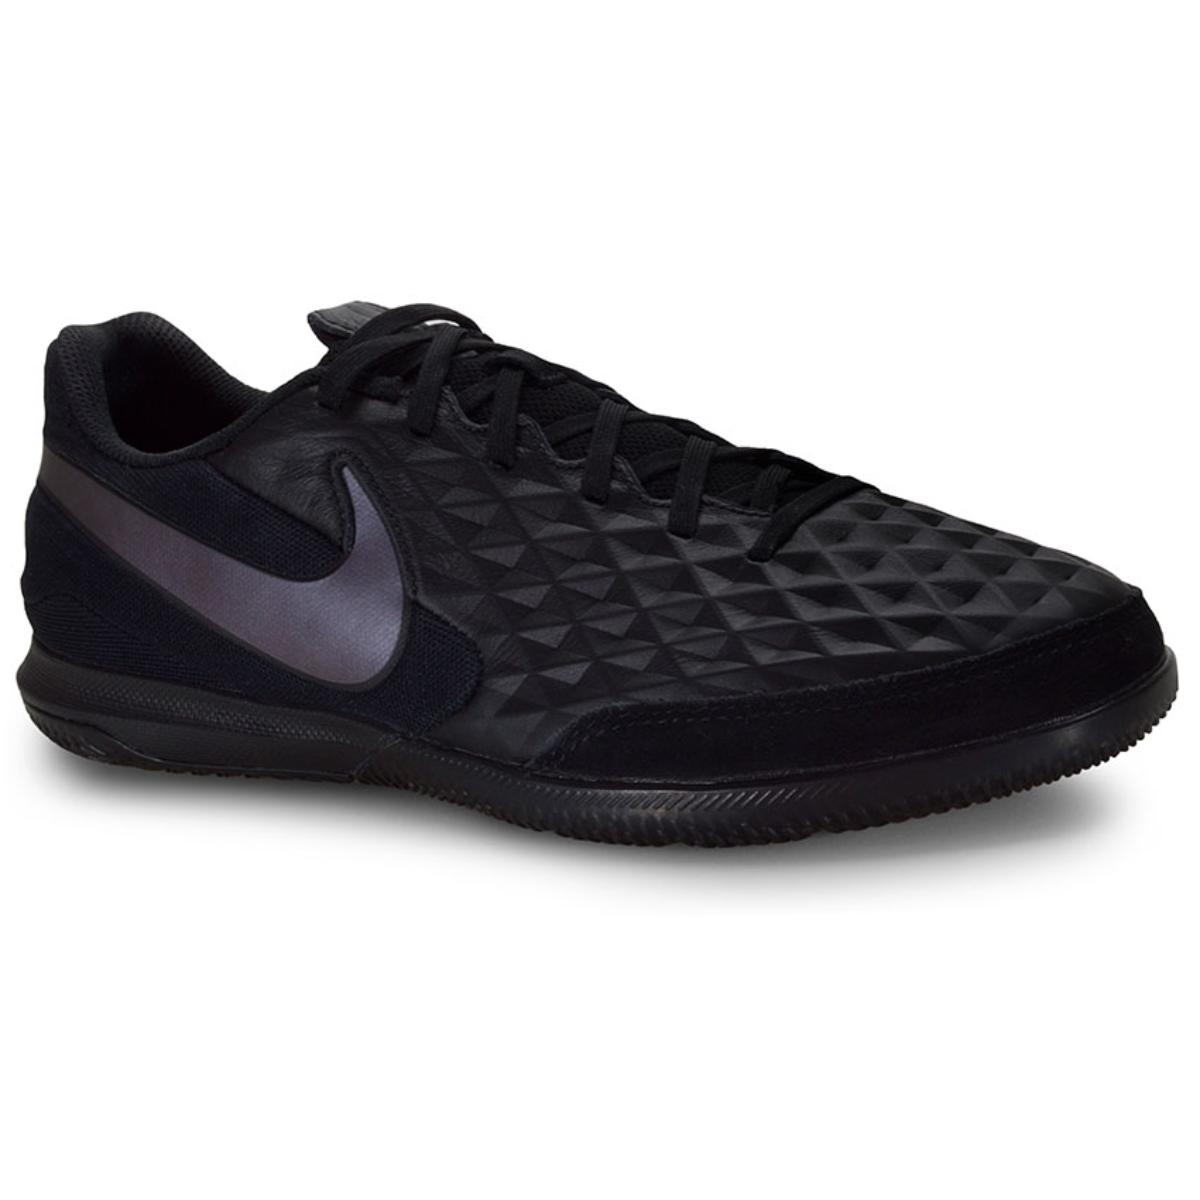 Tênis Masculino Nike At6099-010 Tiempo Legend 8 Academy ic Preto